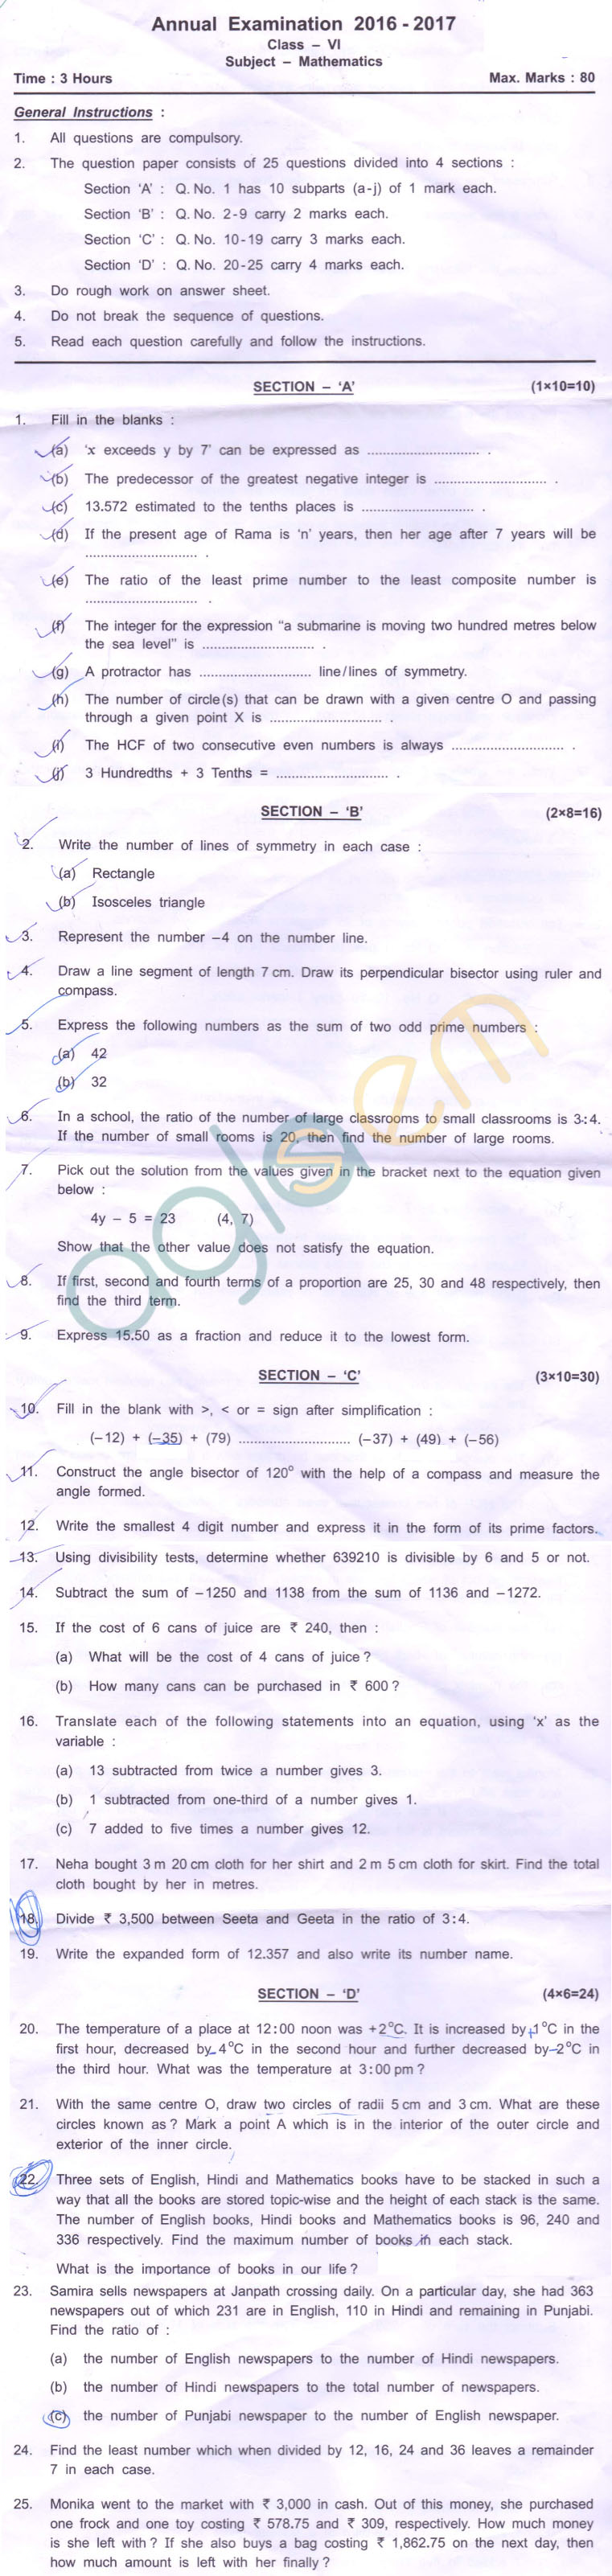 worksheet Math Paper cbse class 6 sa2 question paper for math aglasem schools 1